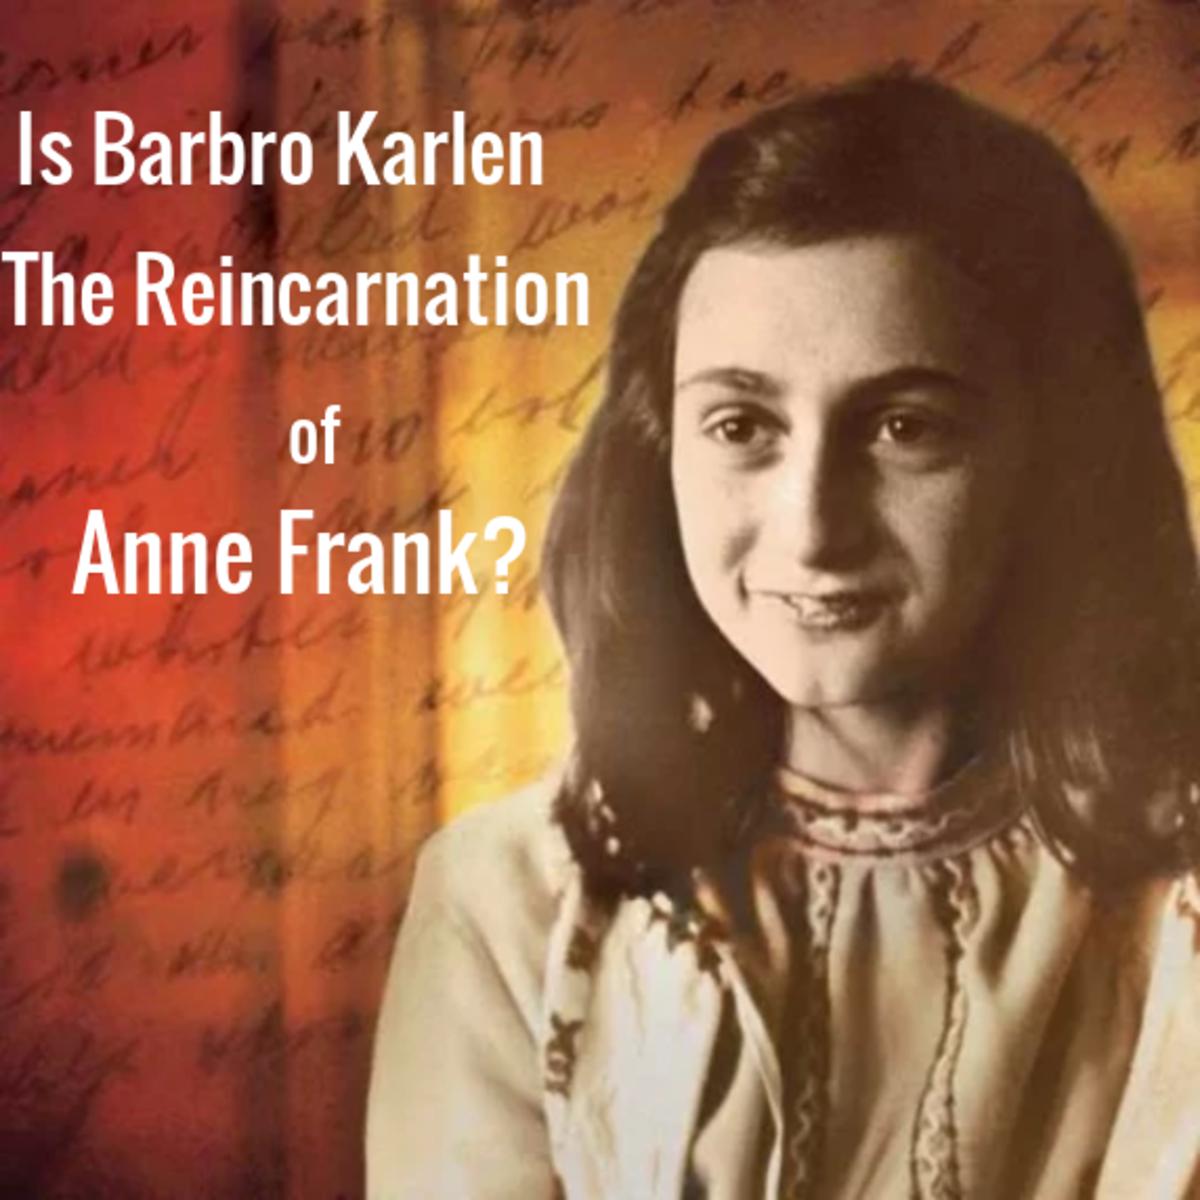 Is Barbro Karlén the Reincarnation of Anne Frank?